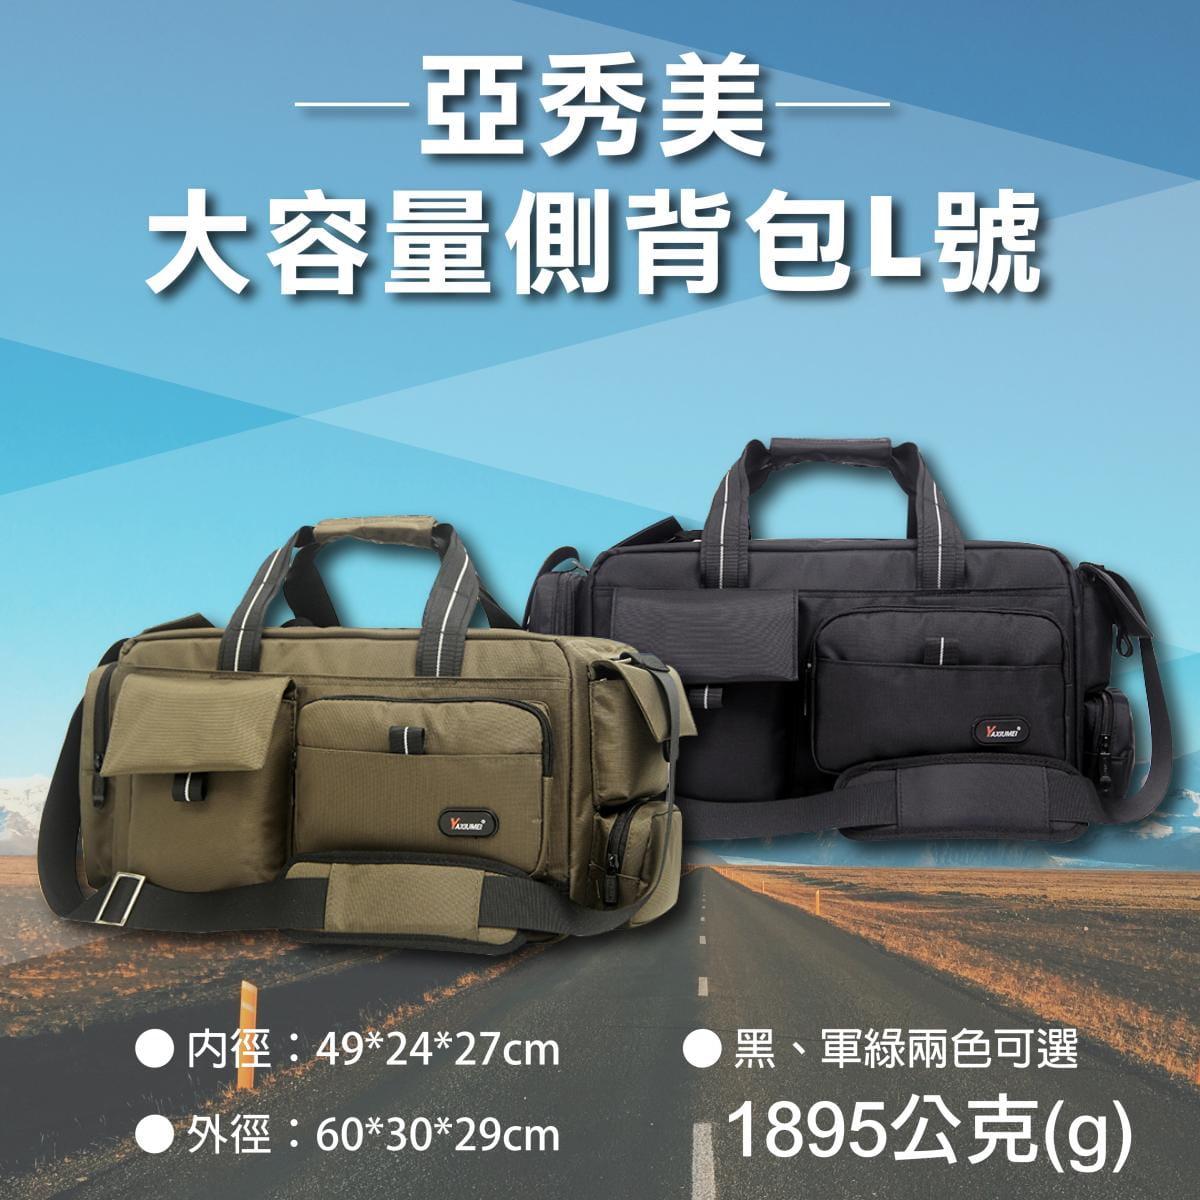 YAXIUMEI 亞秀美 大容量側背相機包-L號